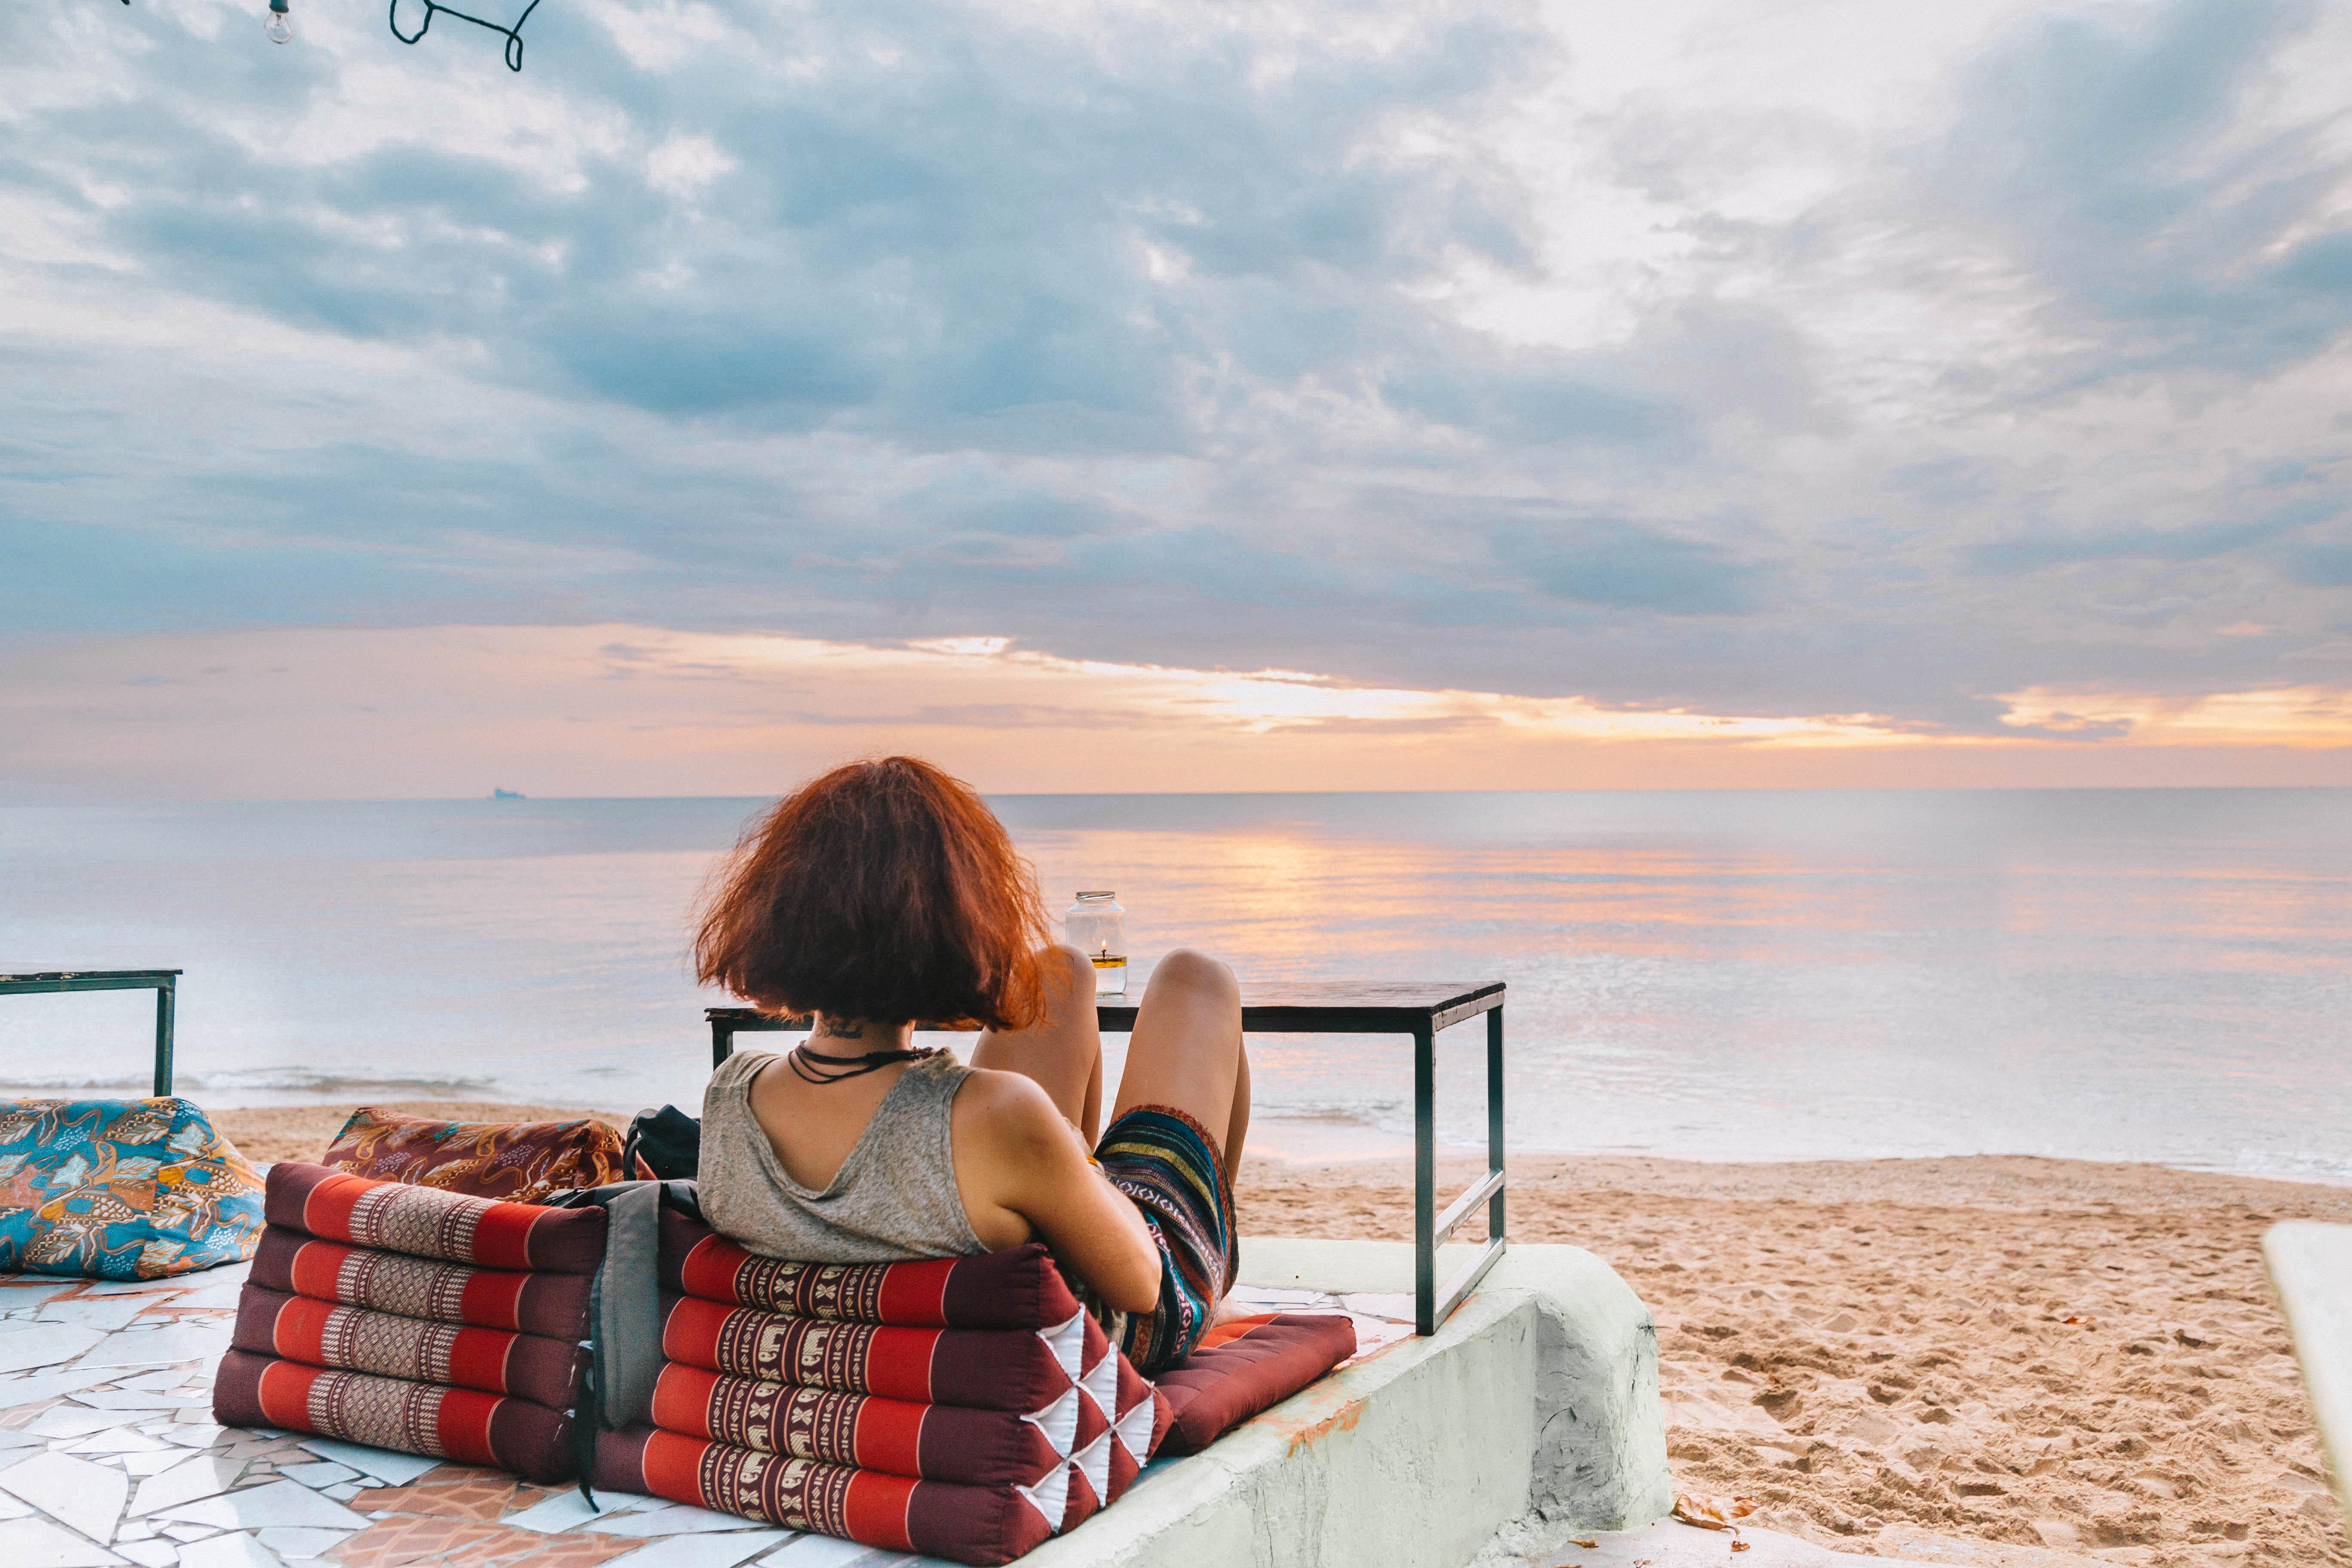 watcing magical sunset in koh lanta beach life vitamin sea